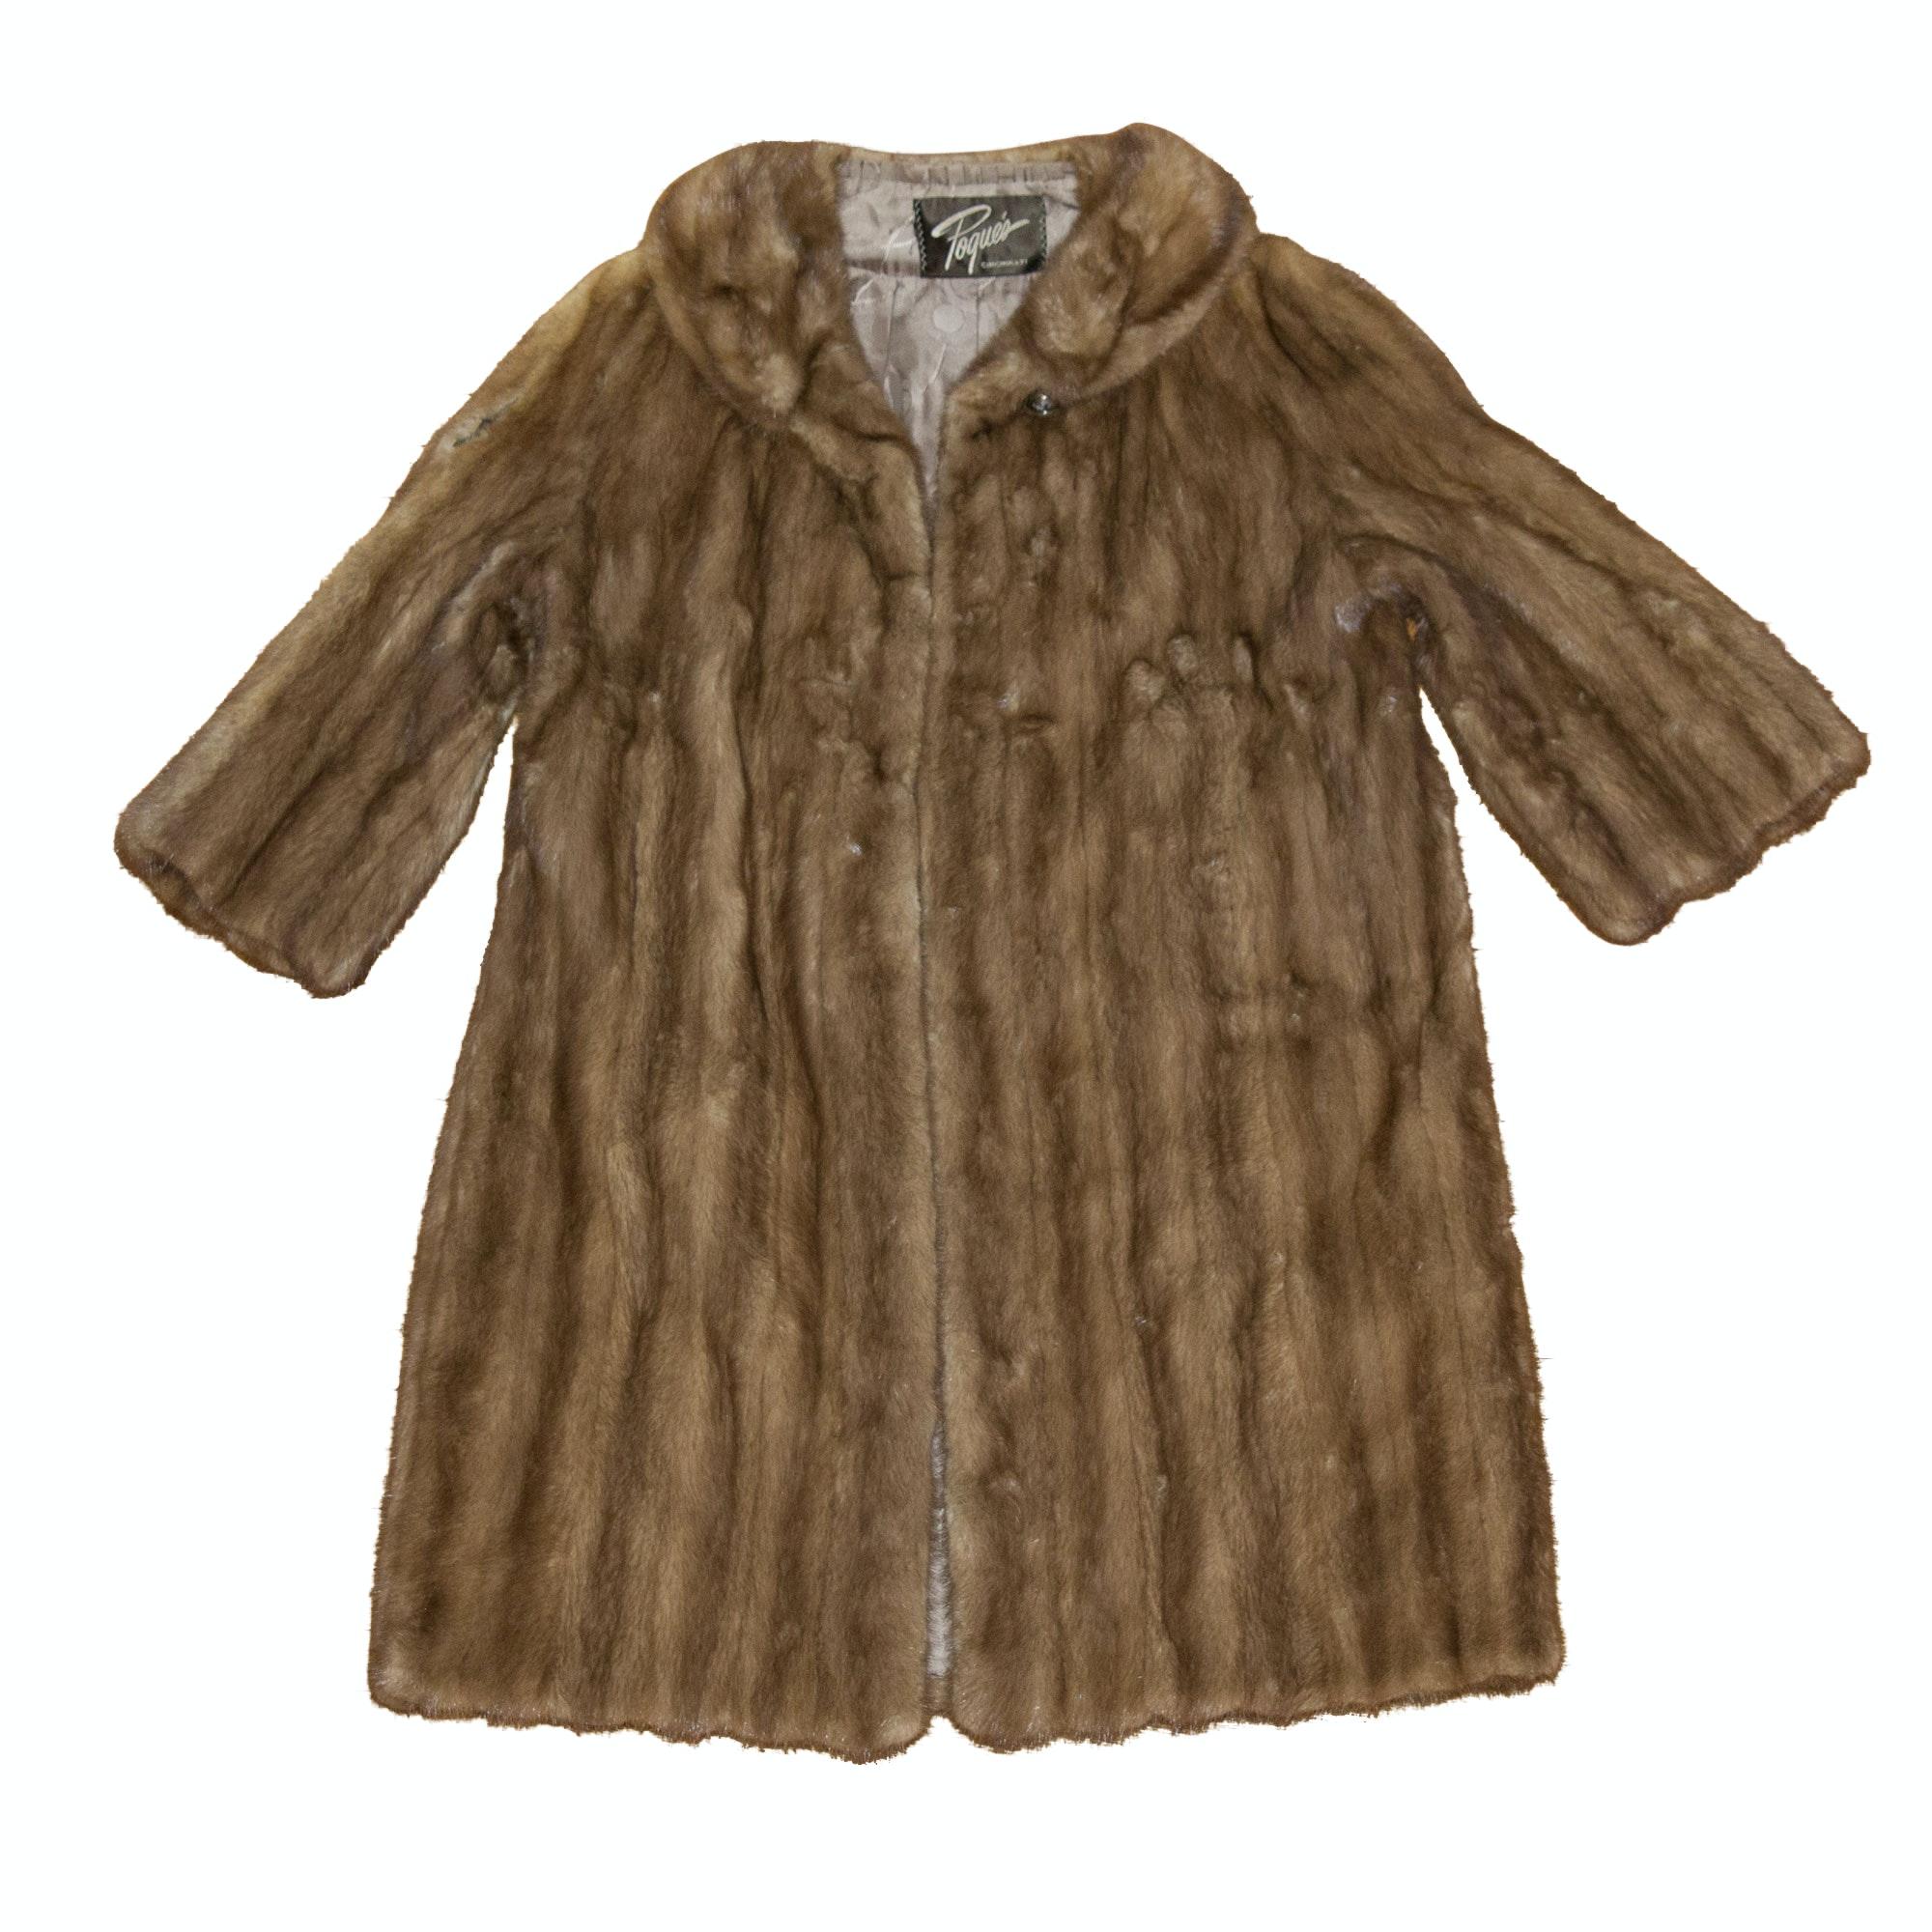 Vintage Pogues Mink Fur Coat